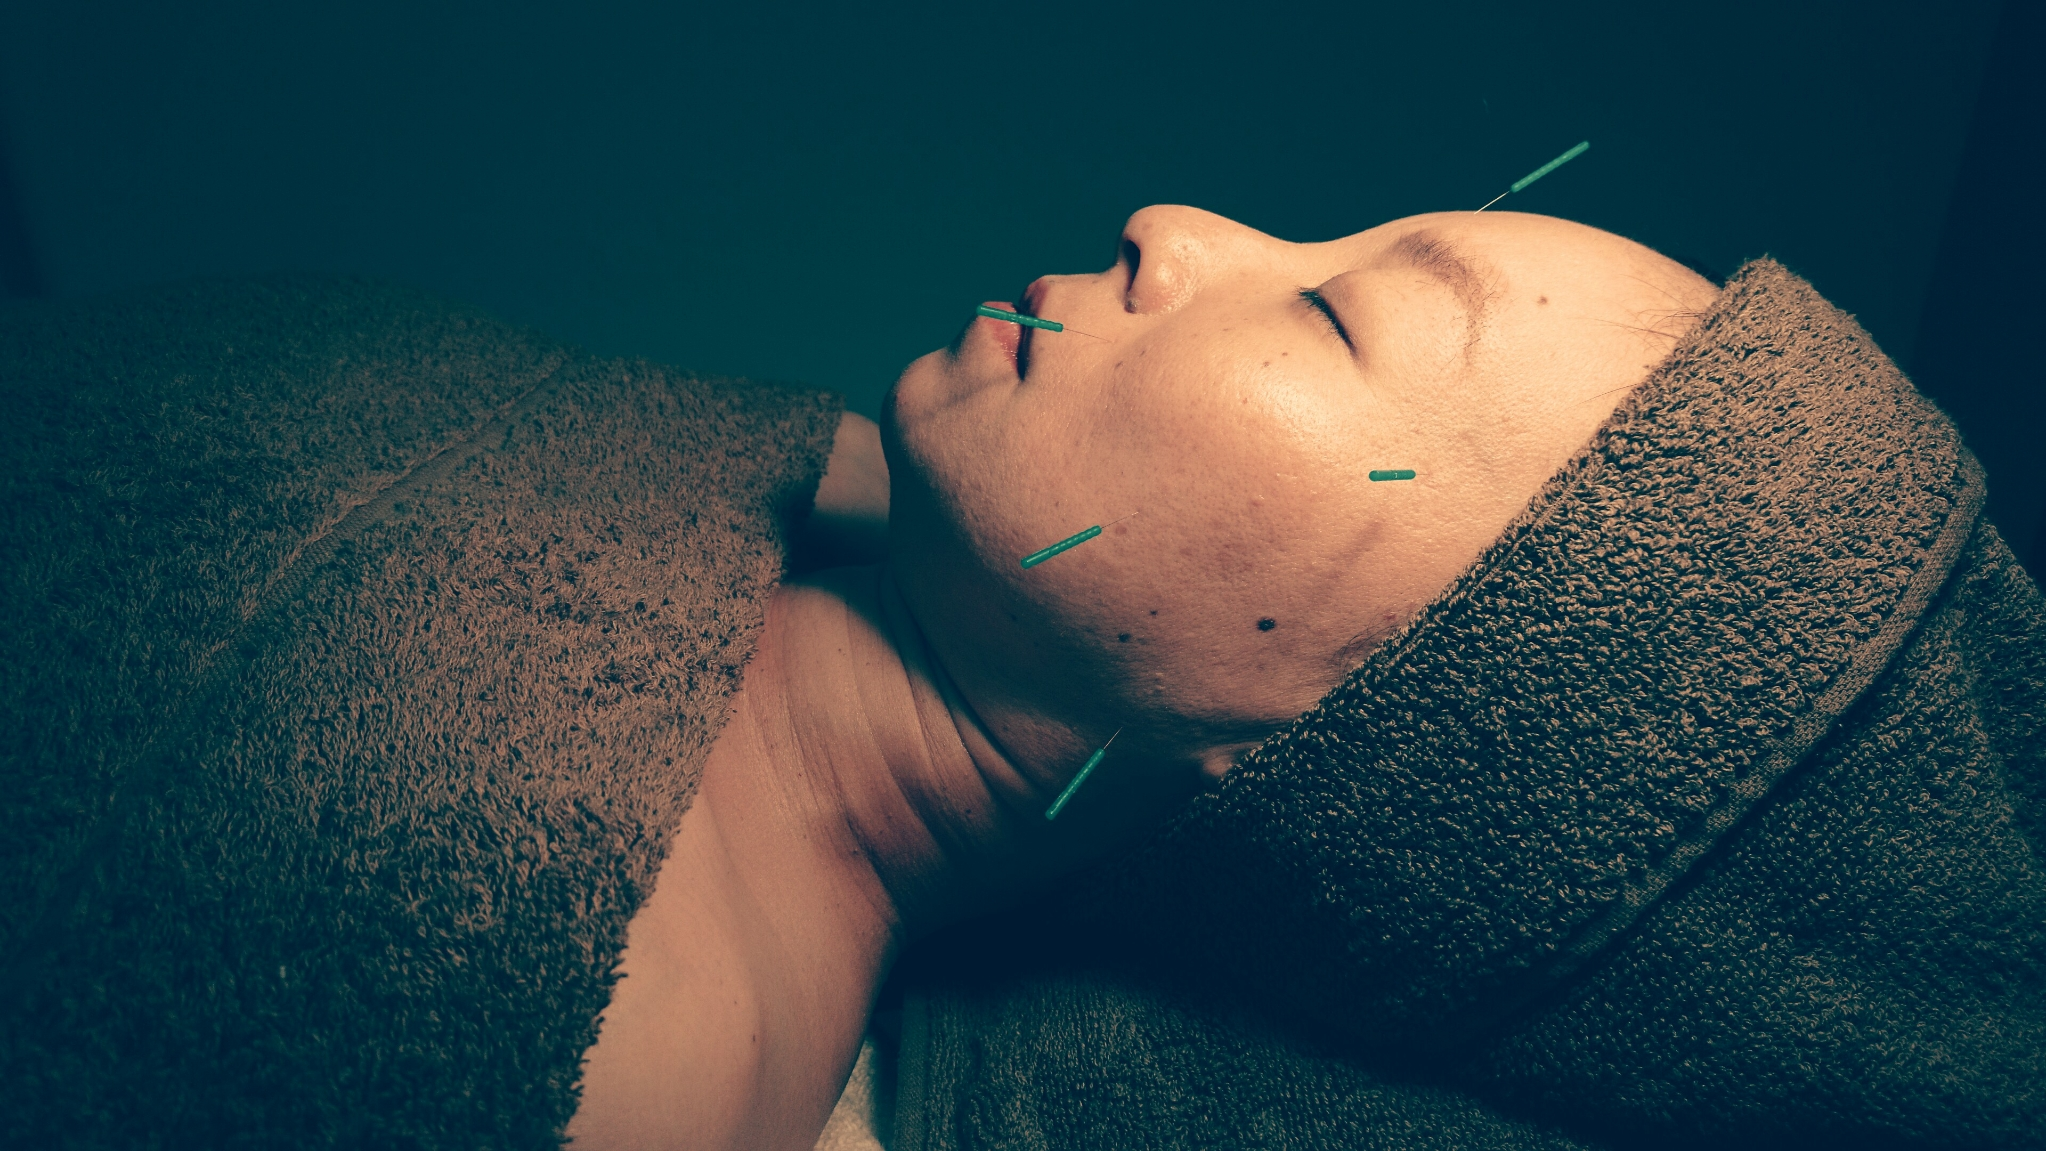 花の木治療院 美容鍼